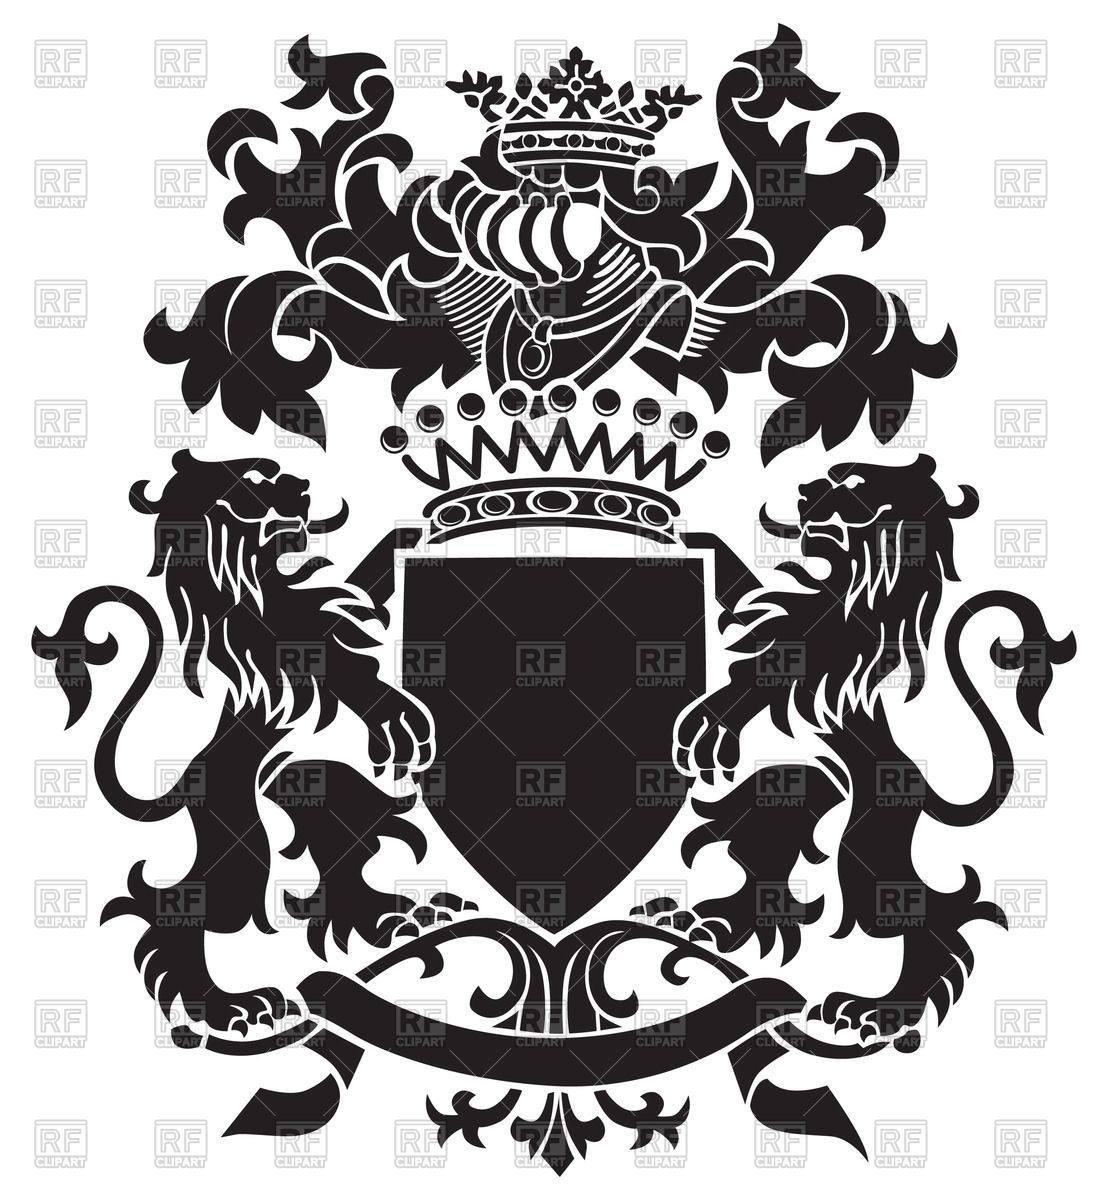 Clipart crest logo clip art royalty free download Medieval heraldic emblem - royal coat of arms with lions, shield and ... clip art royalty free download